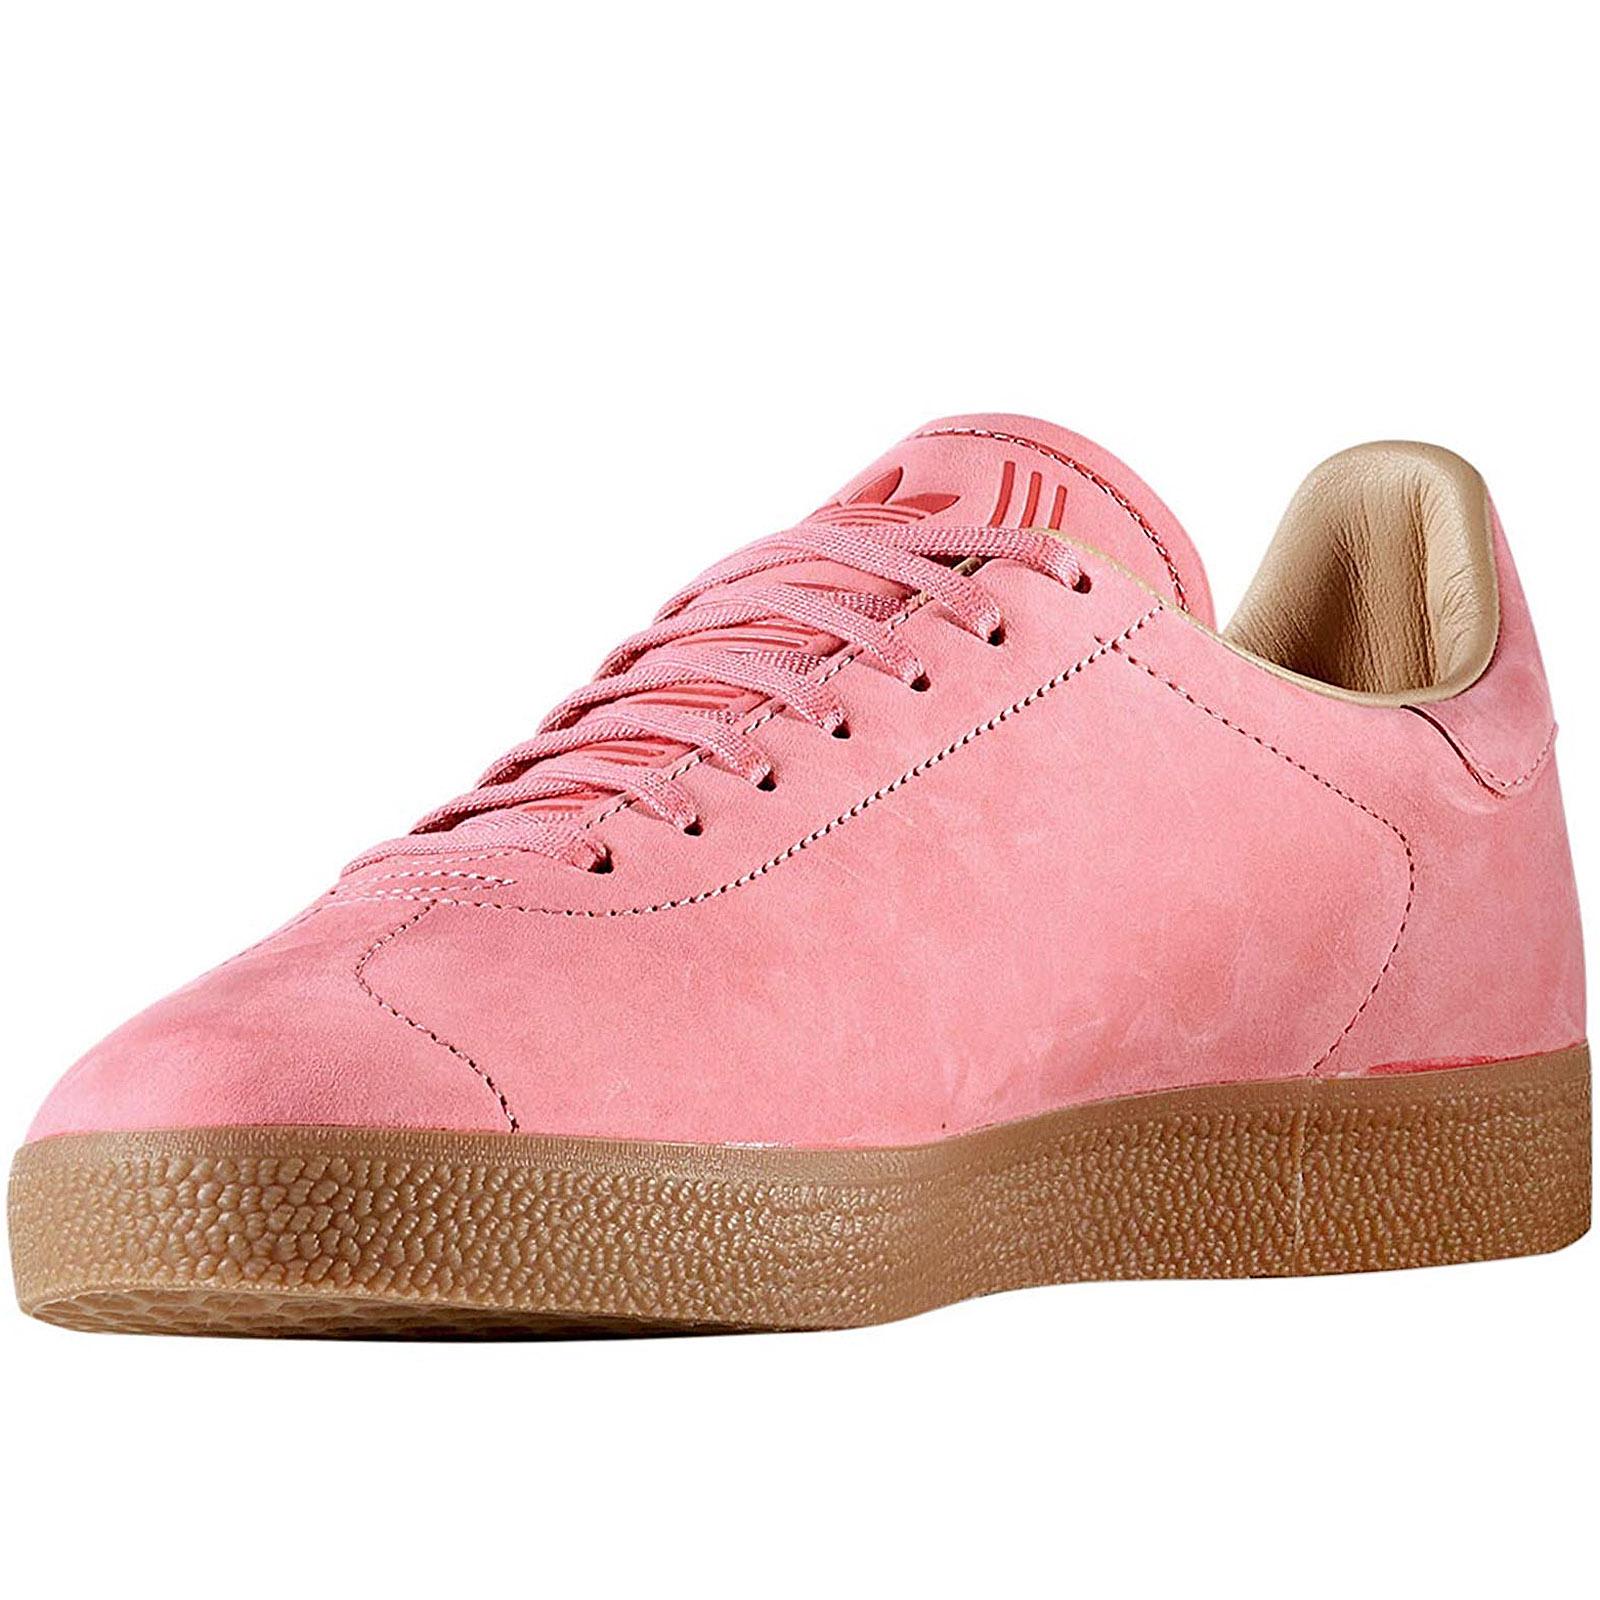 adidas gazelle rosa hombre